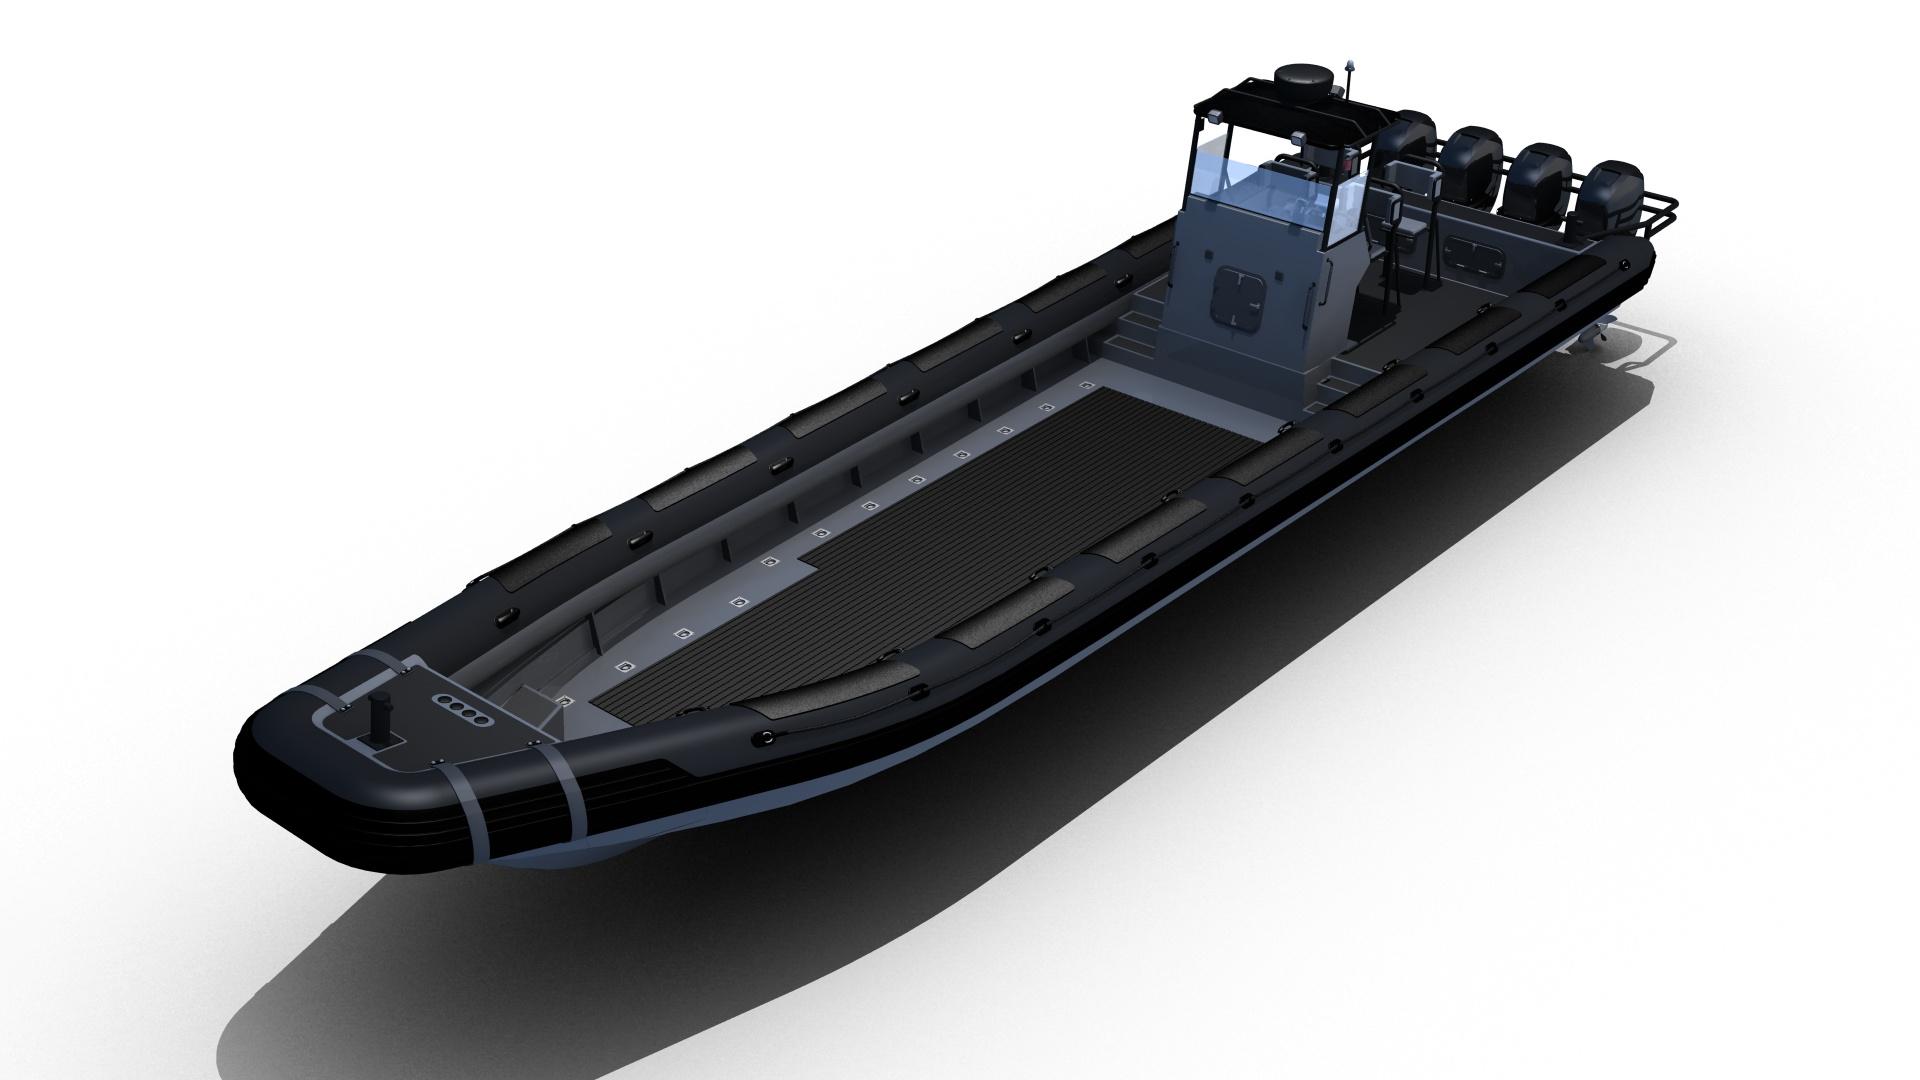 https://www.m-ribs.eu/wp-content/uploads/MRC1500-Cargo-4x-aanzicht2-720x340.jpg